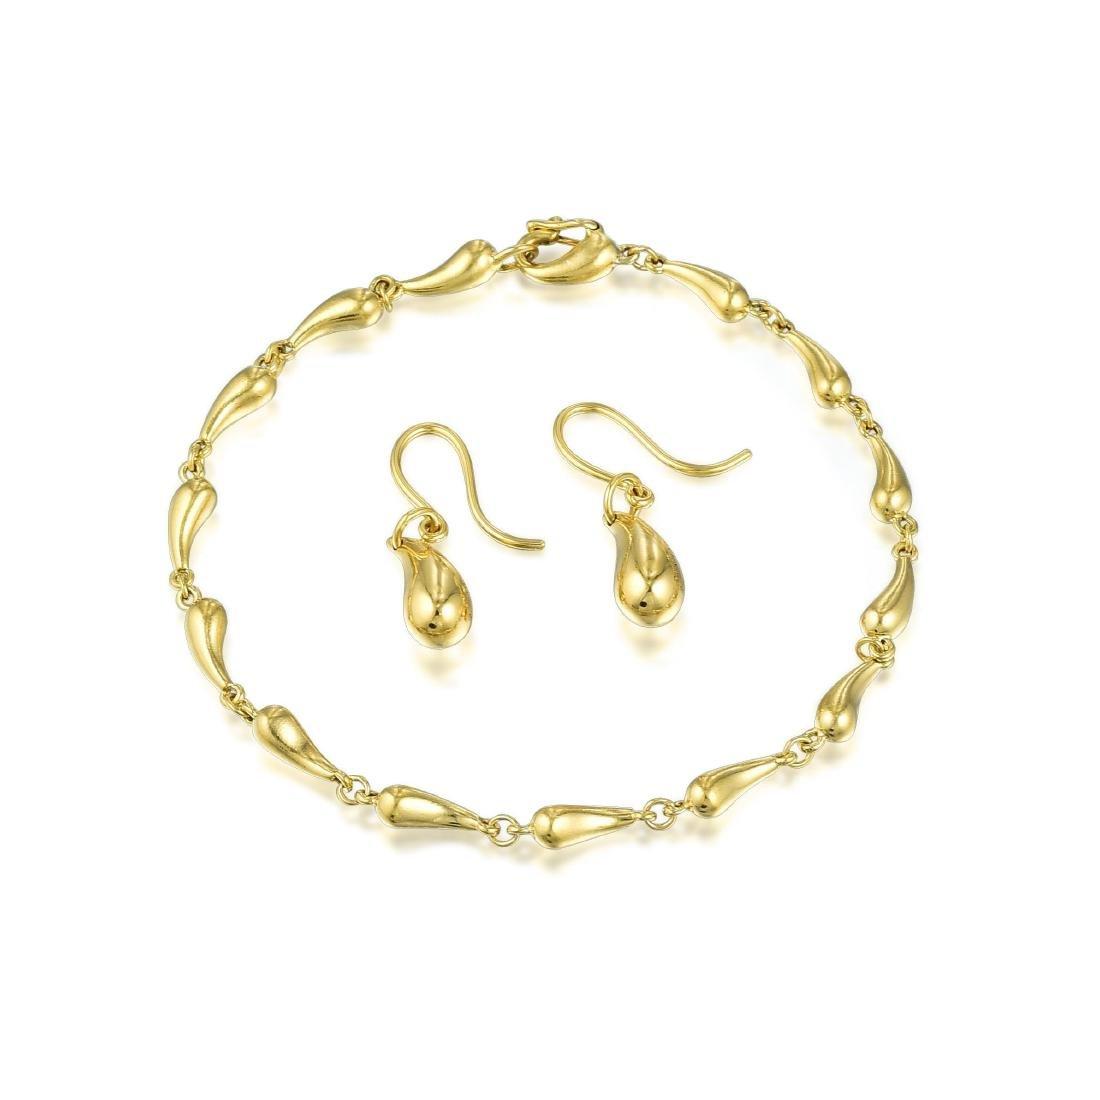 72301458e7c05 Tiffany & Co. Elsa Peretti Teardrop Earring and